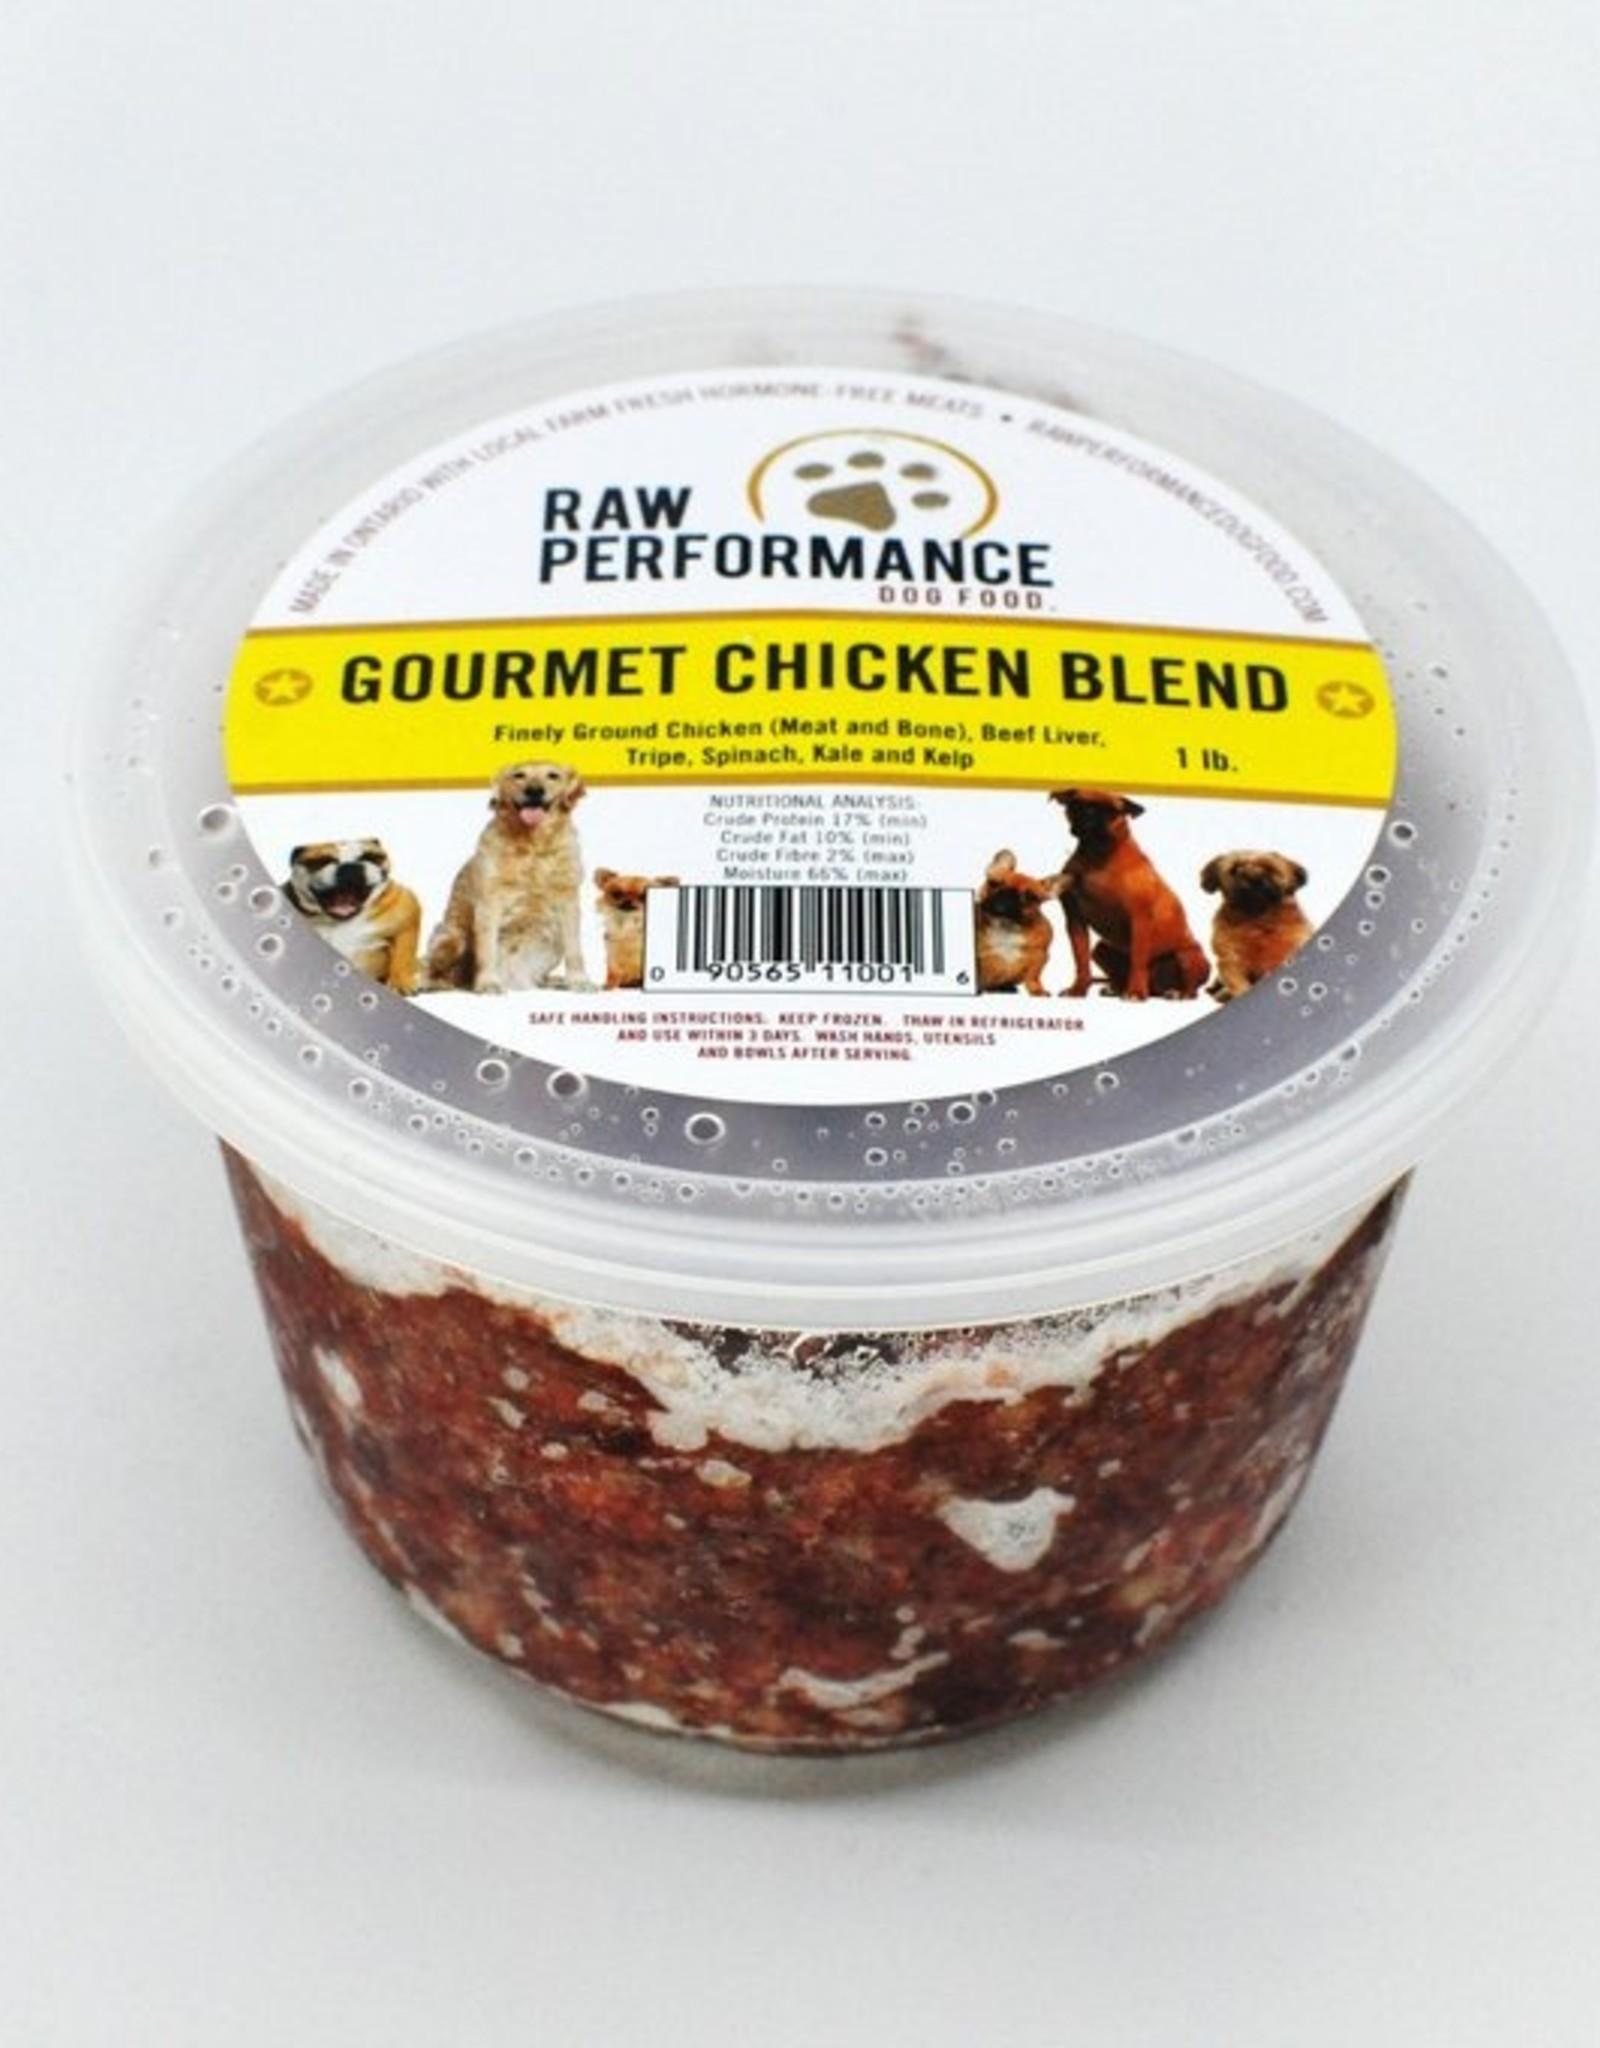 Raw Performance Raw Performance - Gourmet Chicken Blend 1lb